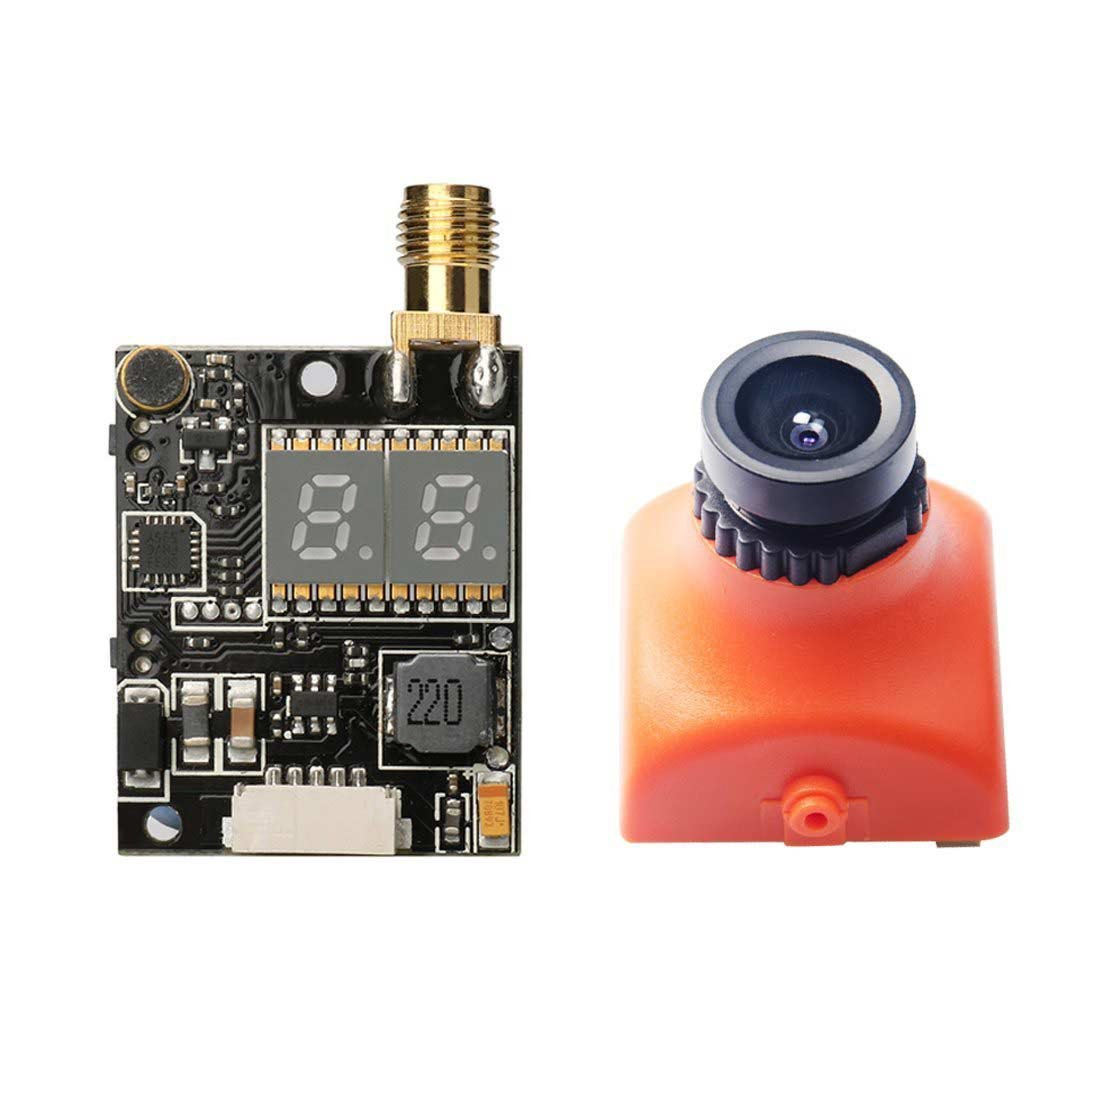 AKK KC02 600mW FPV Transmitter with 600TVL 2.8MM 120 Degree  CCD Camera